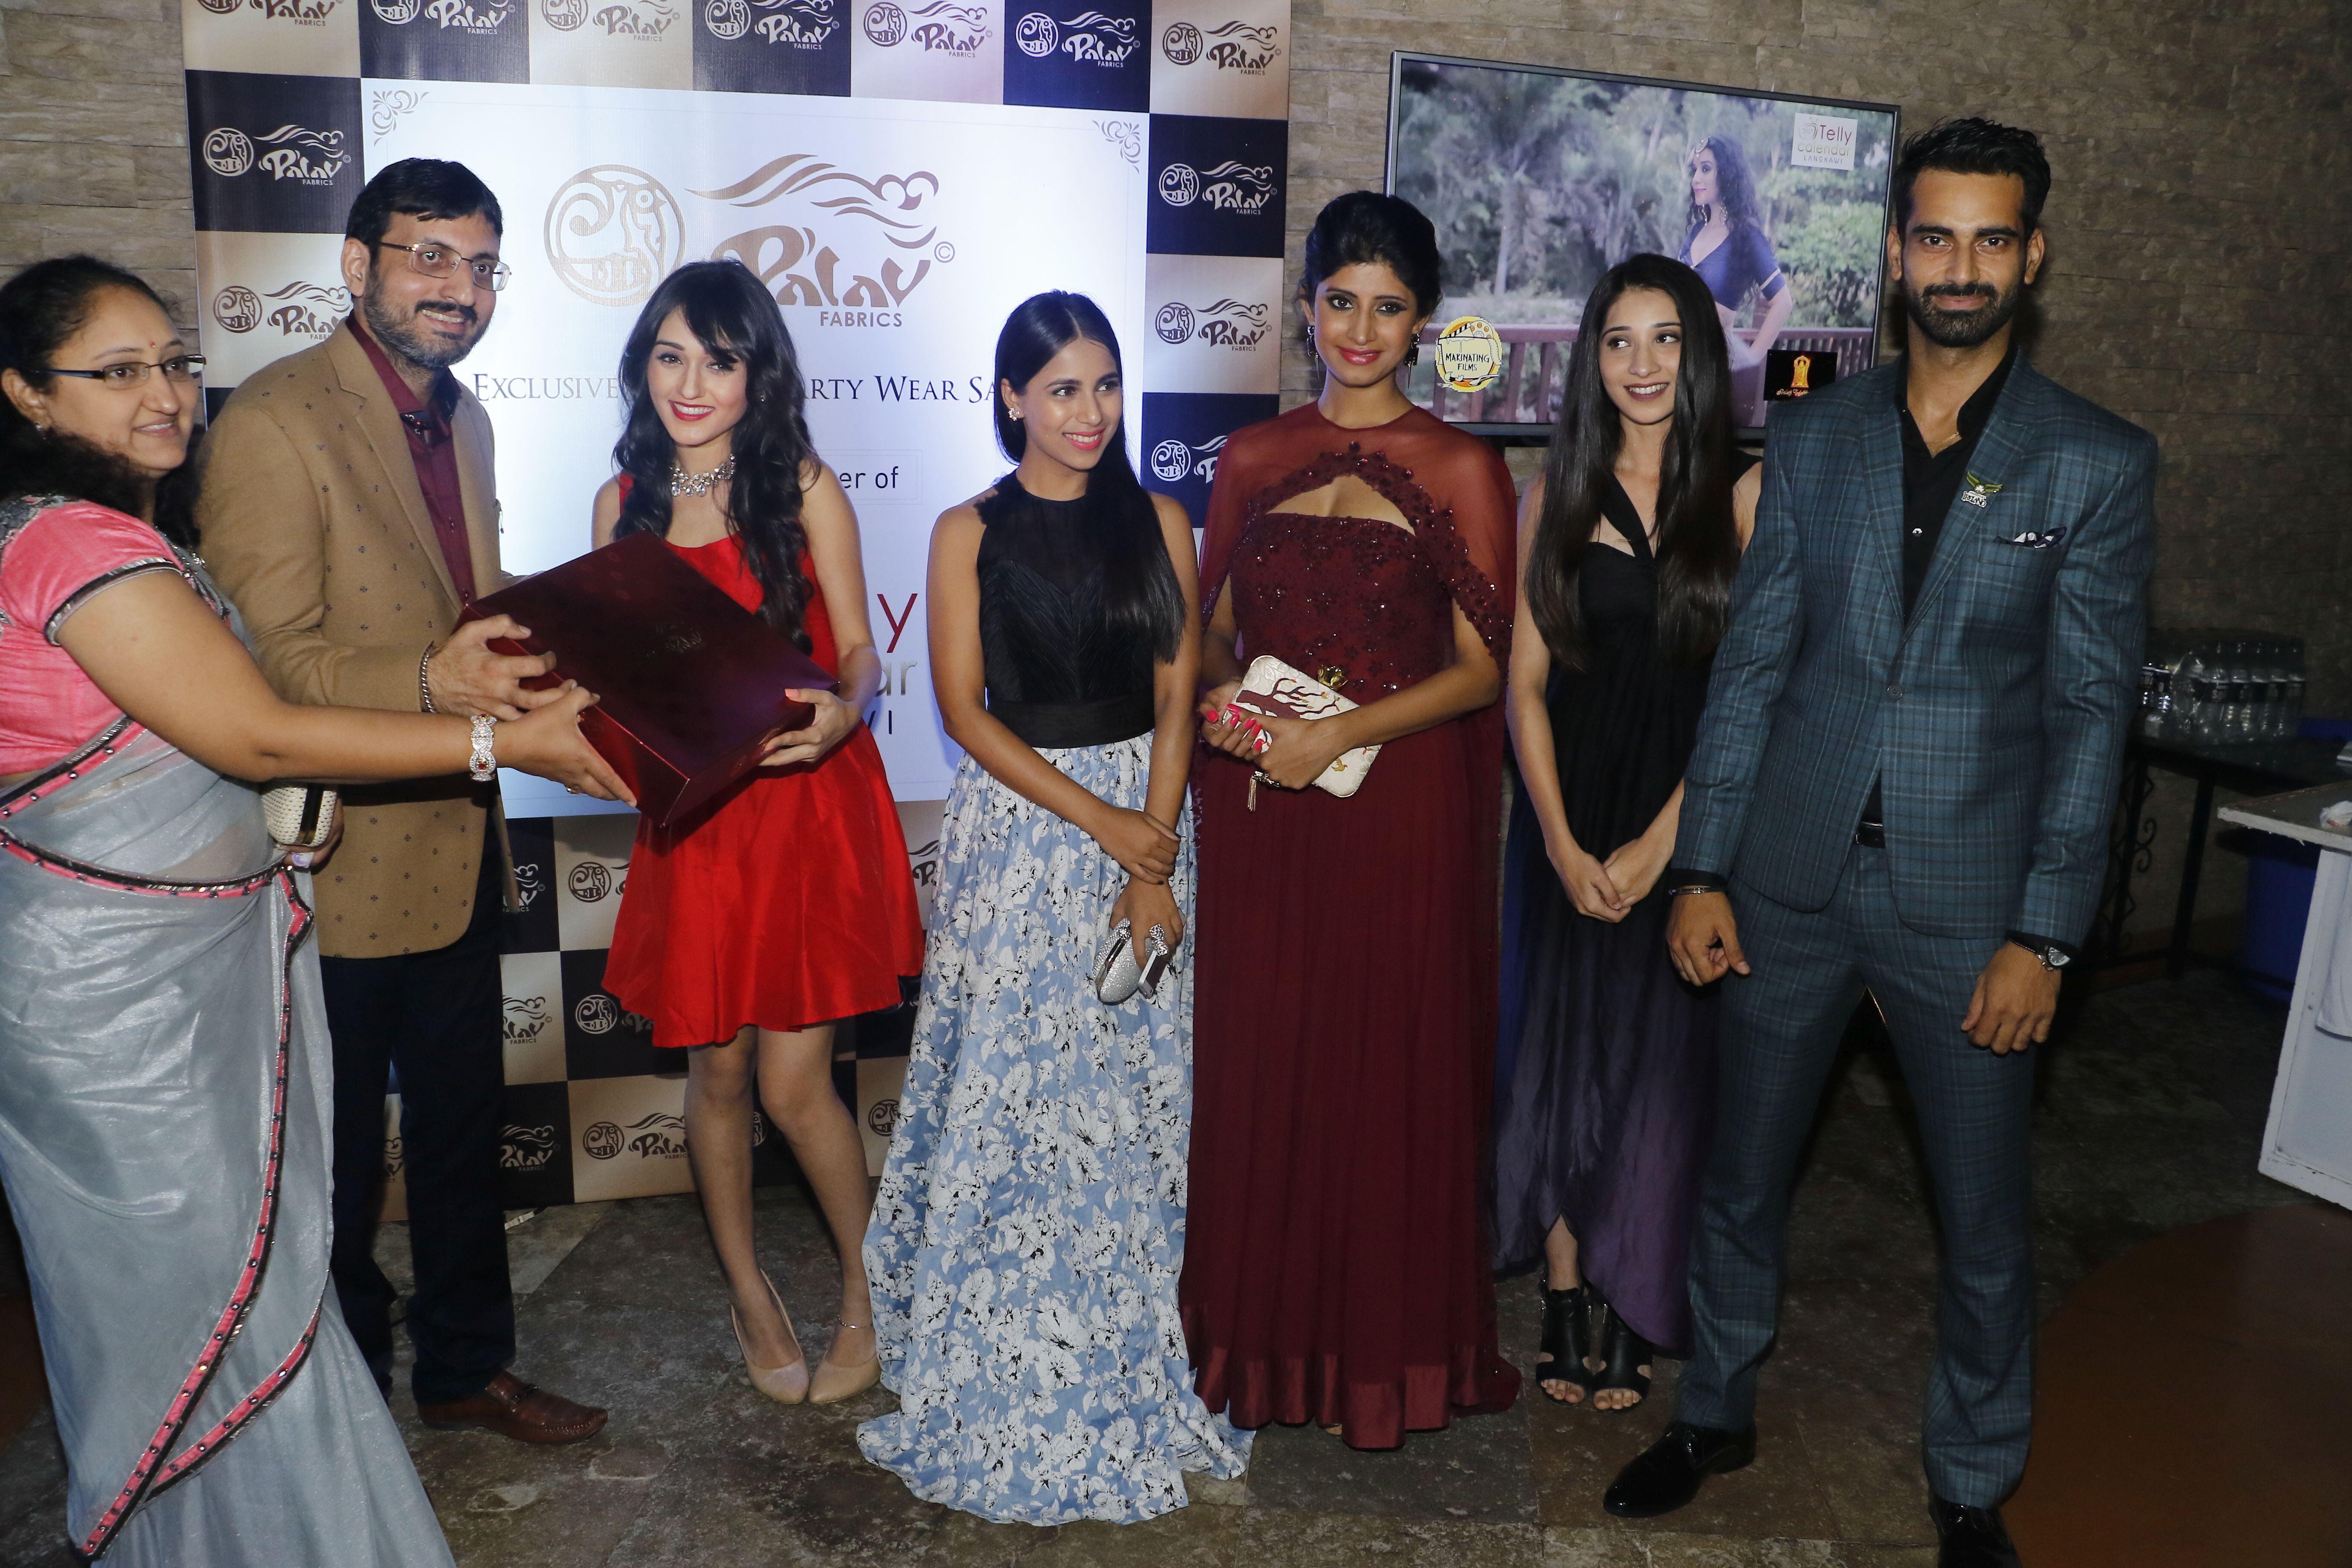 mr-kalpesh-modh-founder-palav-fabrics-and-sunny-arora-director-marinating-films-along-with-the-calendar-girls-the-launch-of-telly-calendar-2017-langkawi